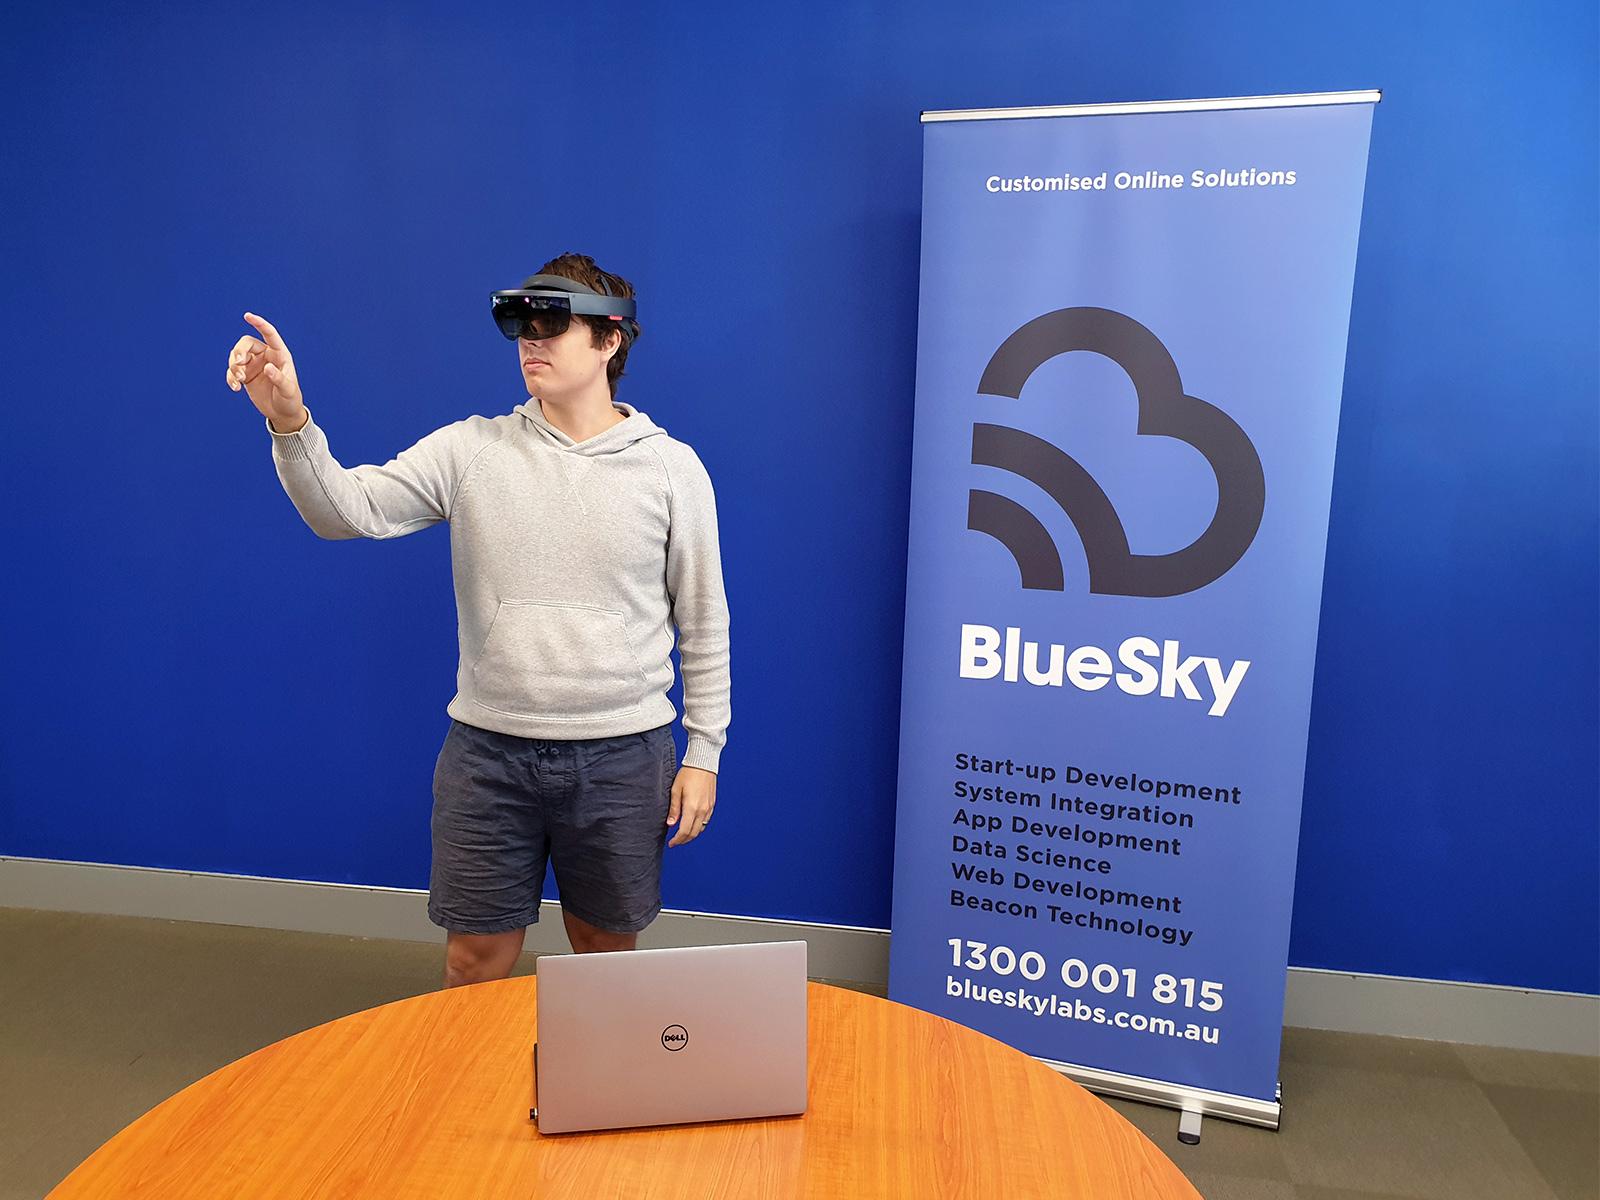 Exploring ideas with Mixed Reality | BlueSky Perth Custom Web + App Development